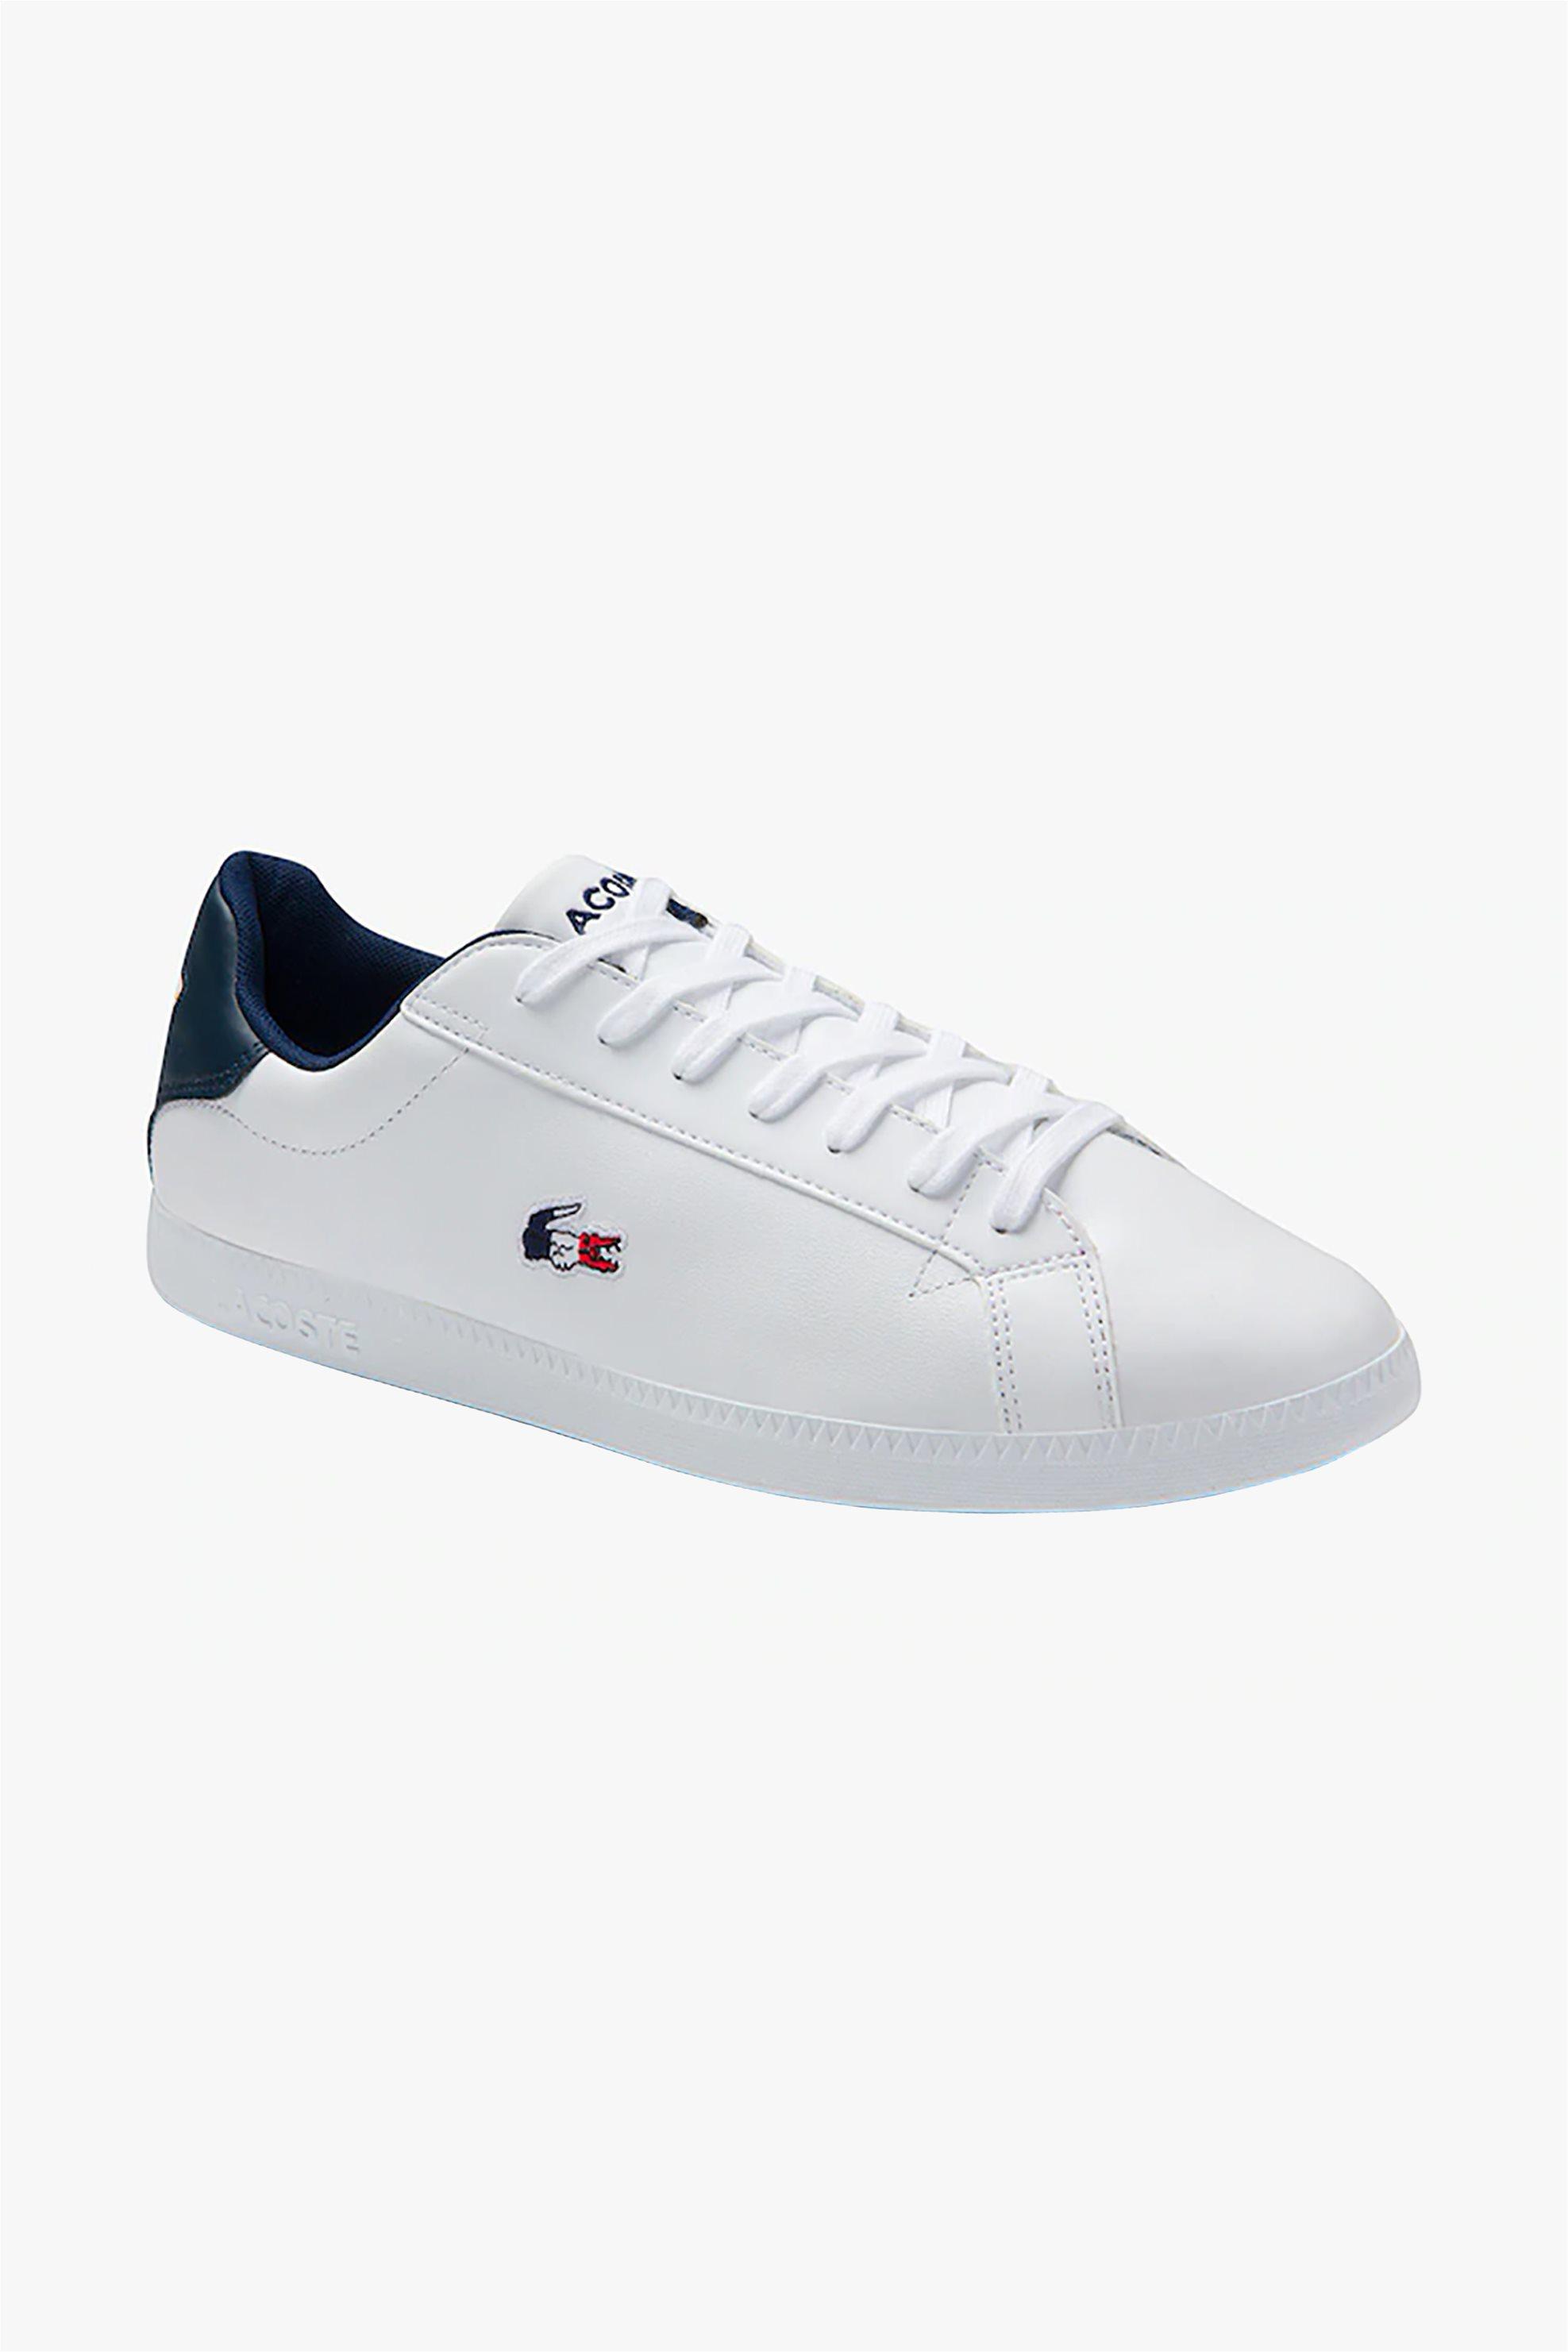 "Lacoste ανδρικά sneakers με κορδόνια ""Graduate Tricolore"" – 39SMA0027407 – Λευκό"